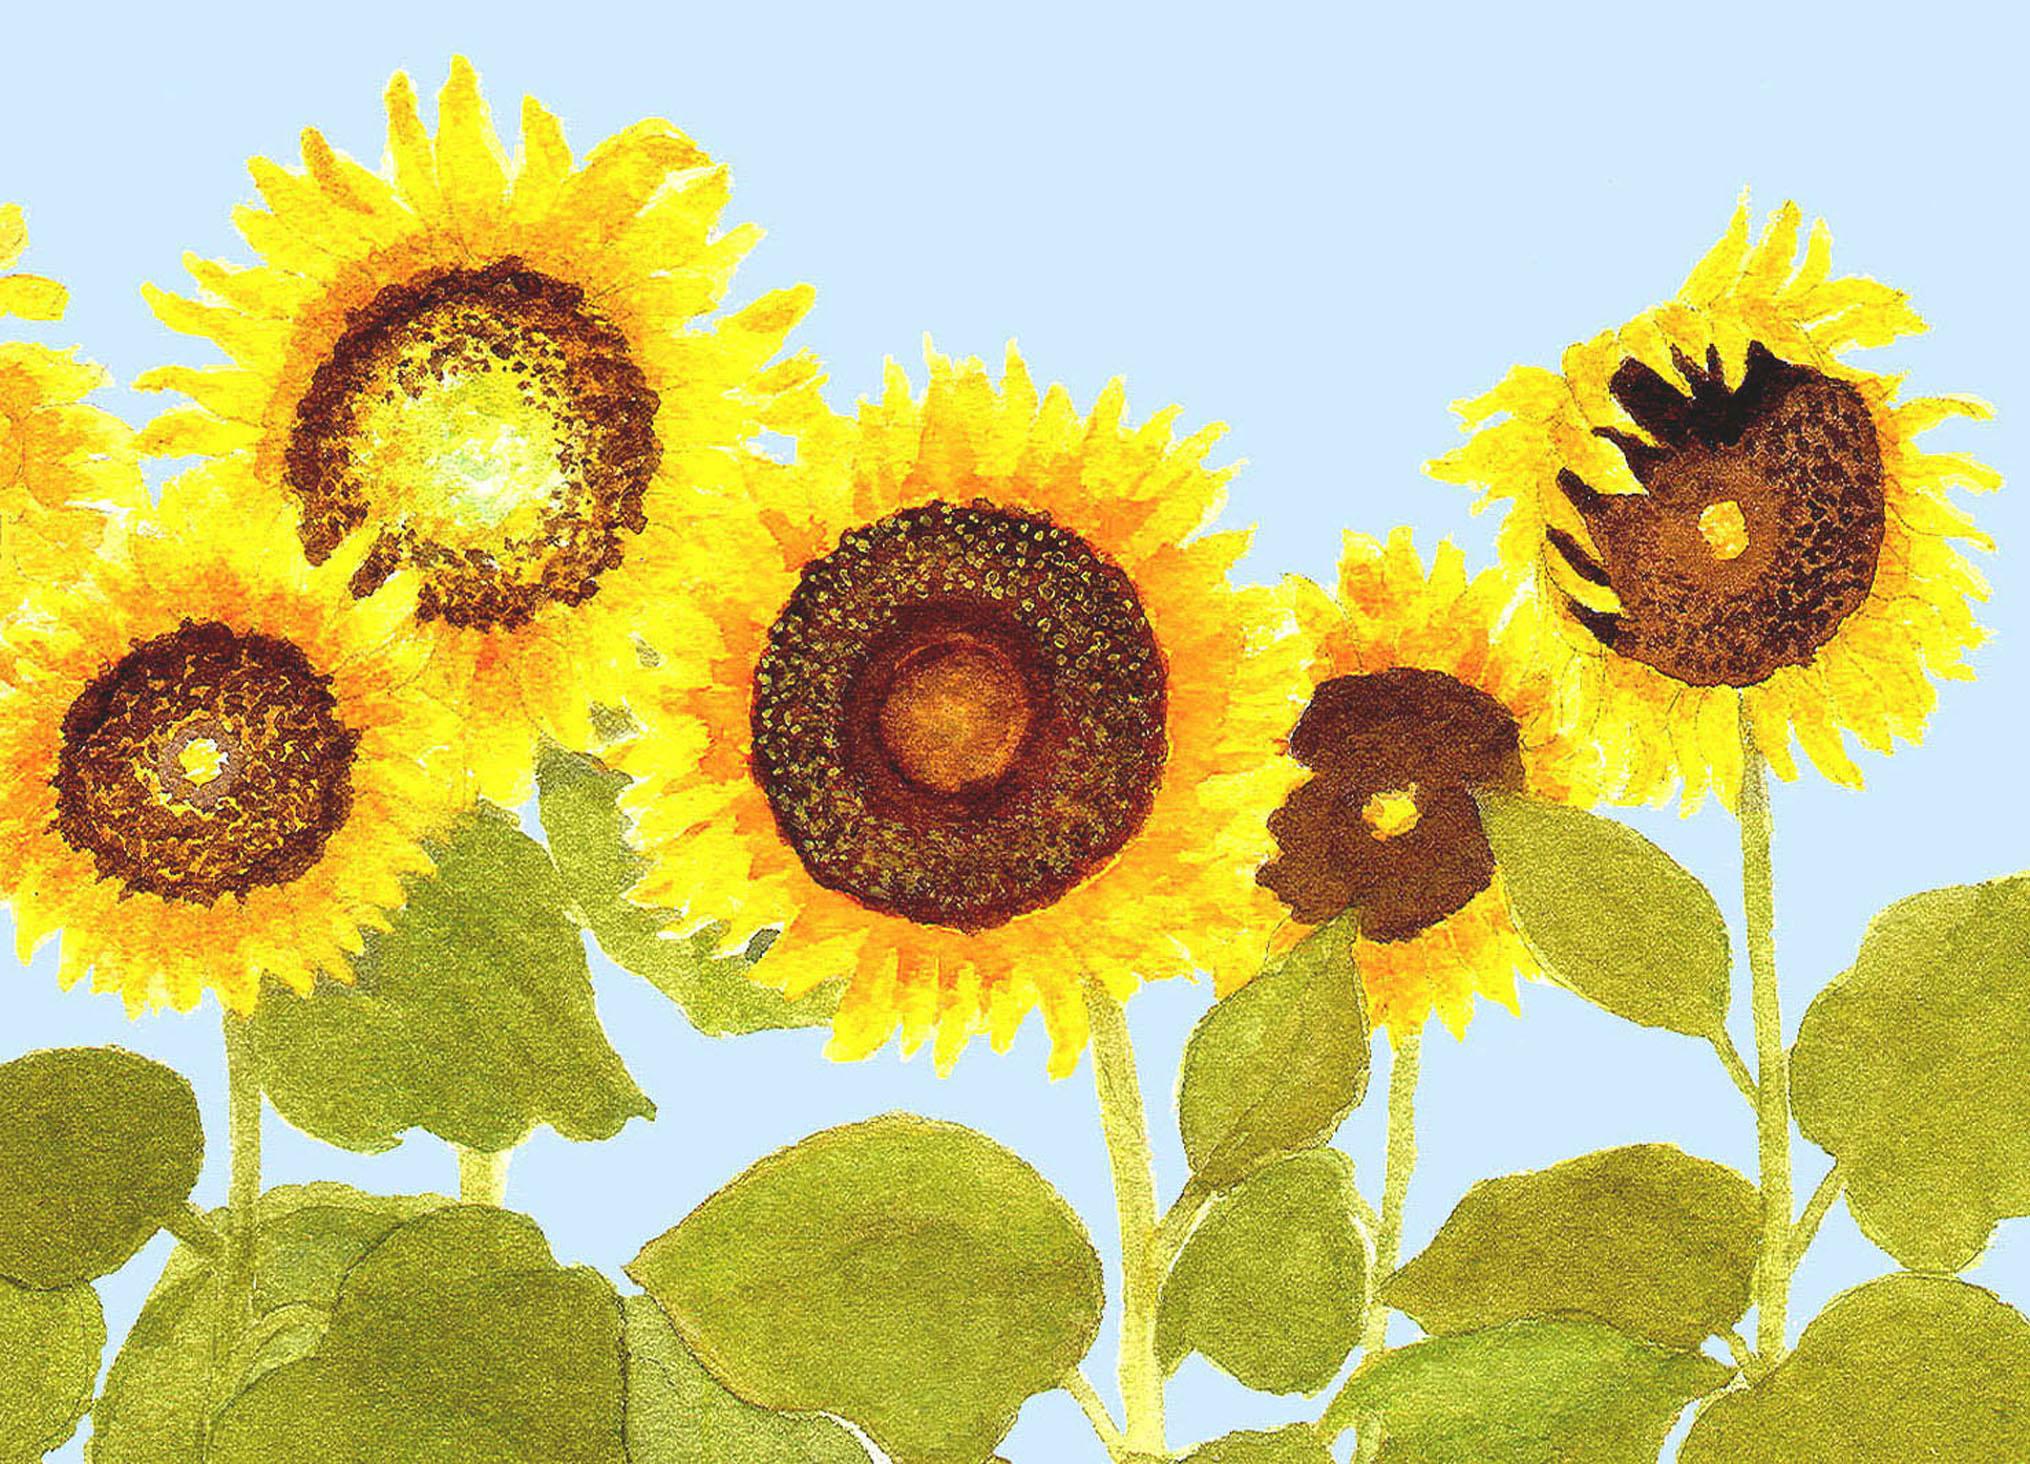 sunflowers 2011 in row.jpg